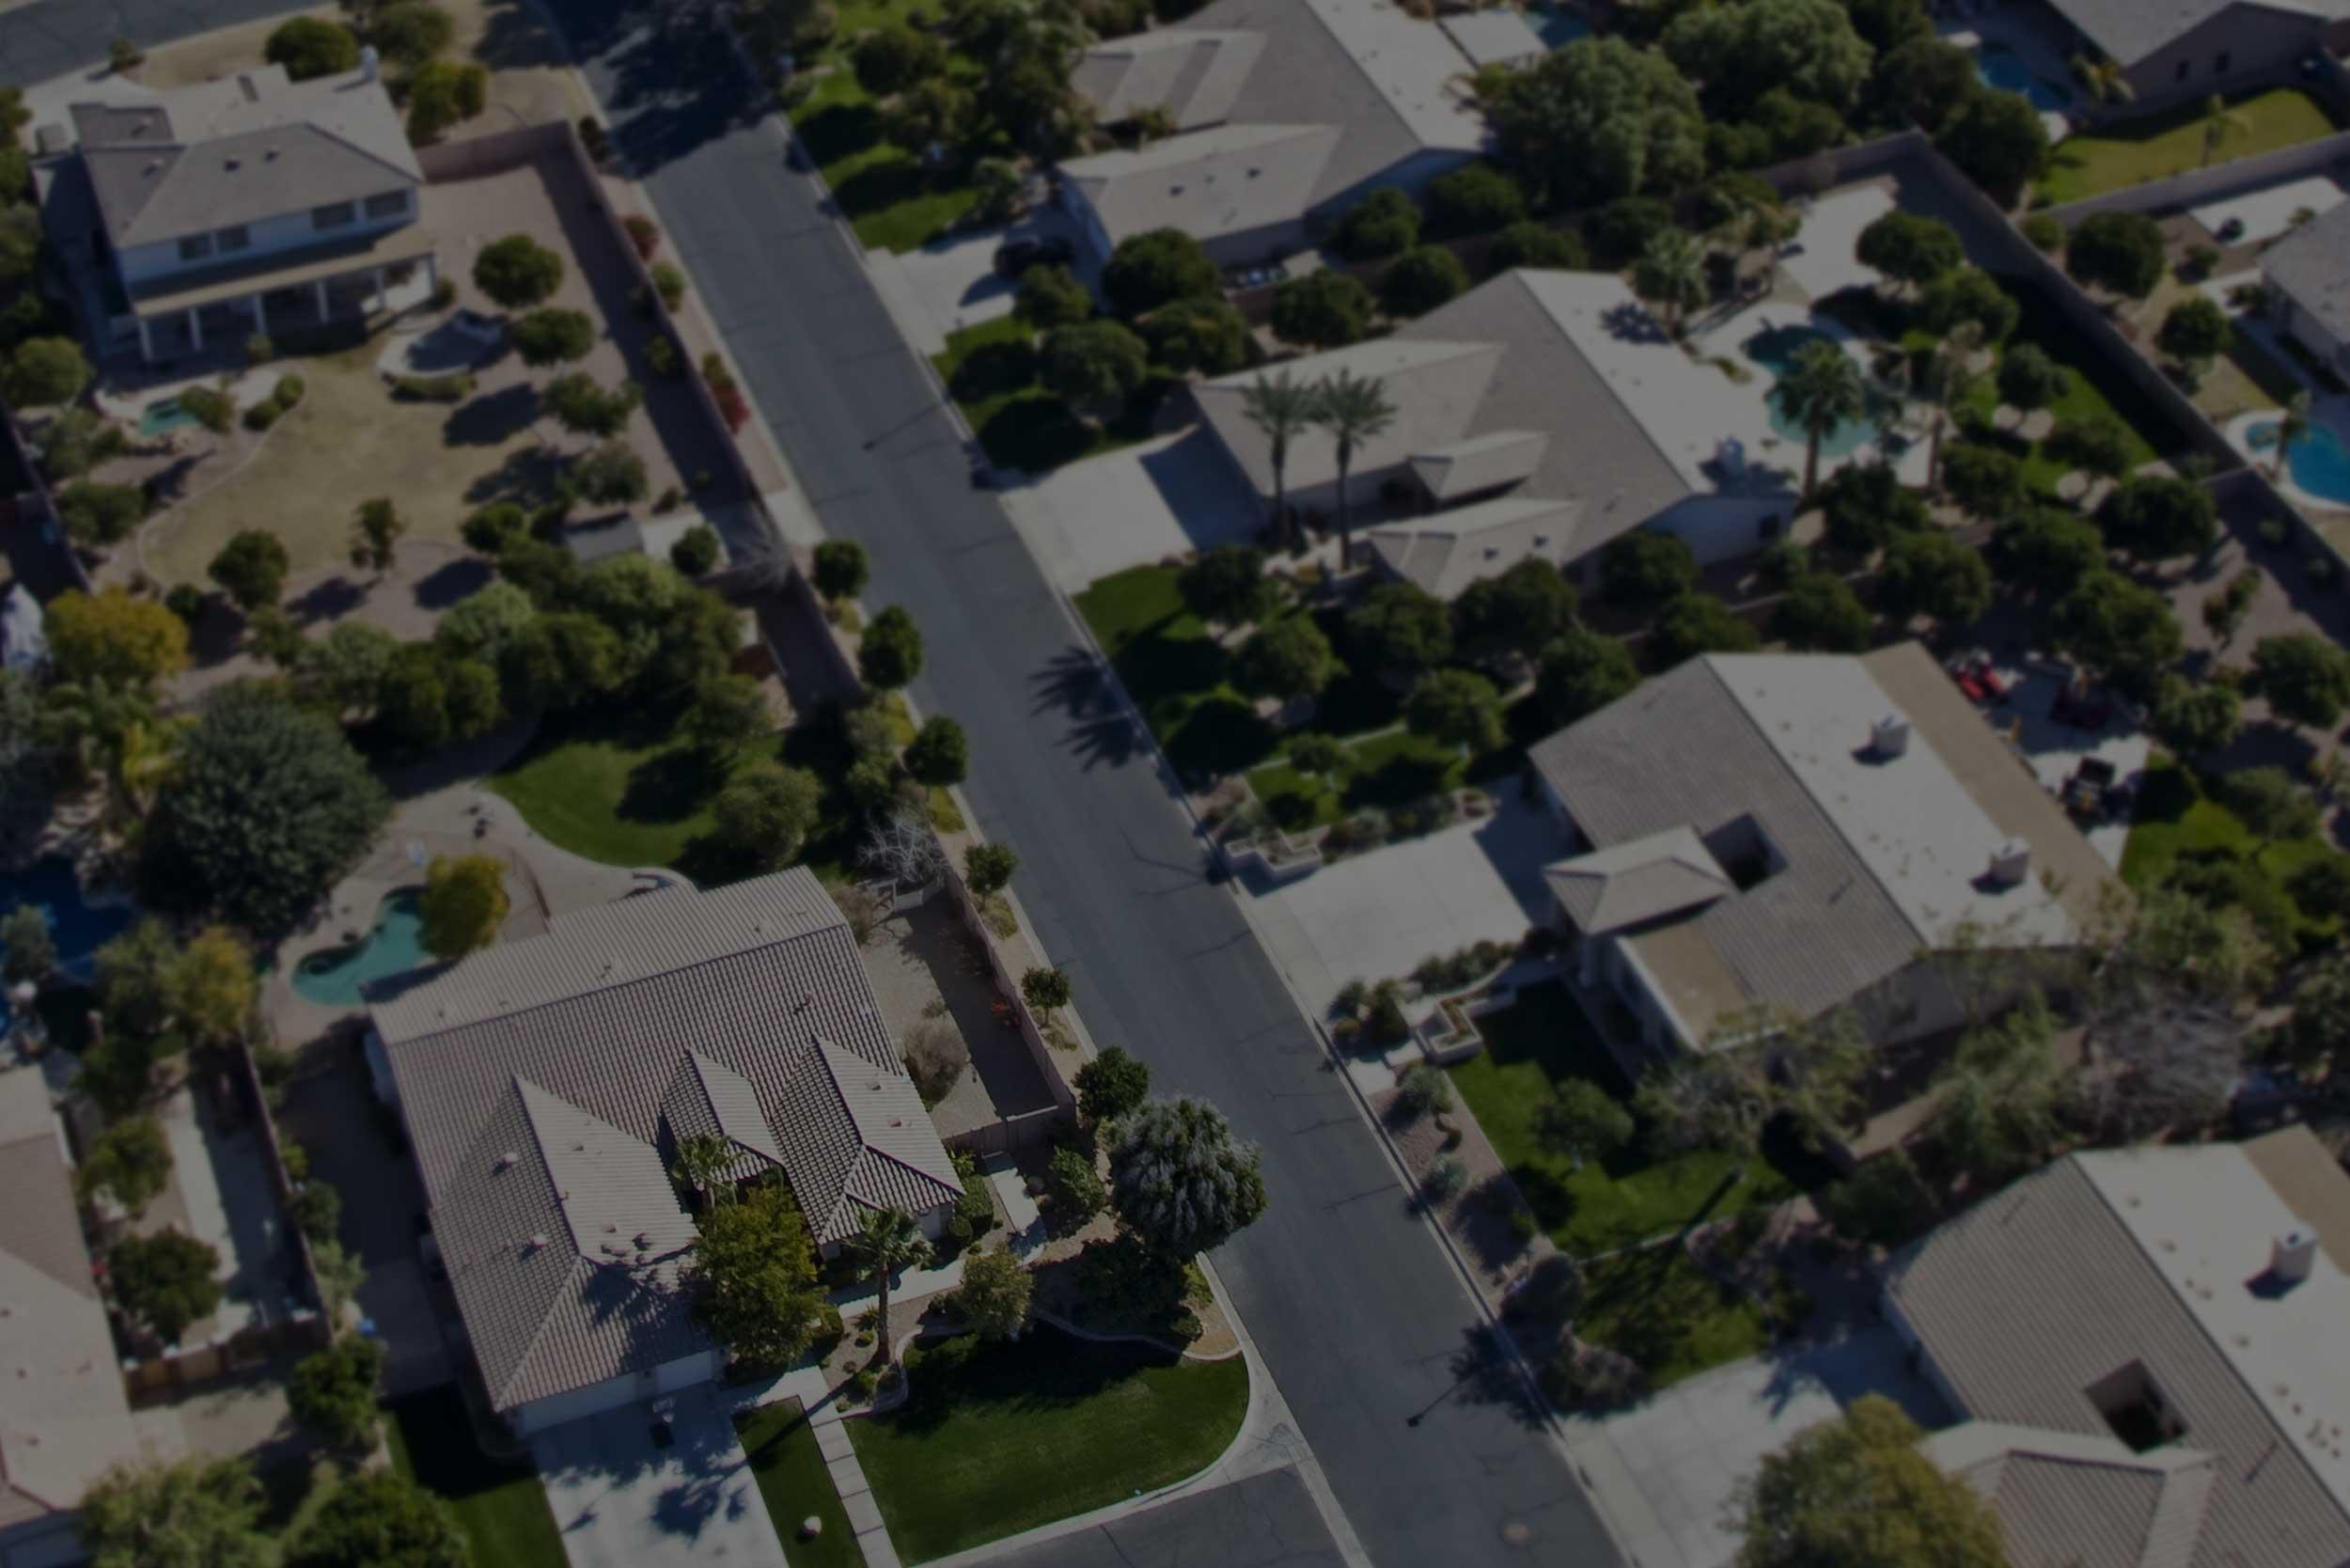 residential real estate - Sam Winter & Co.